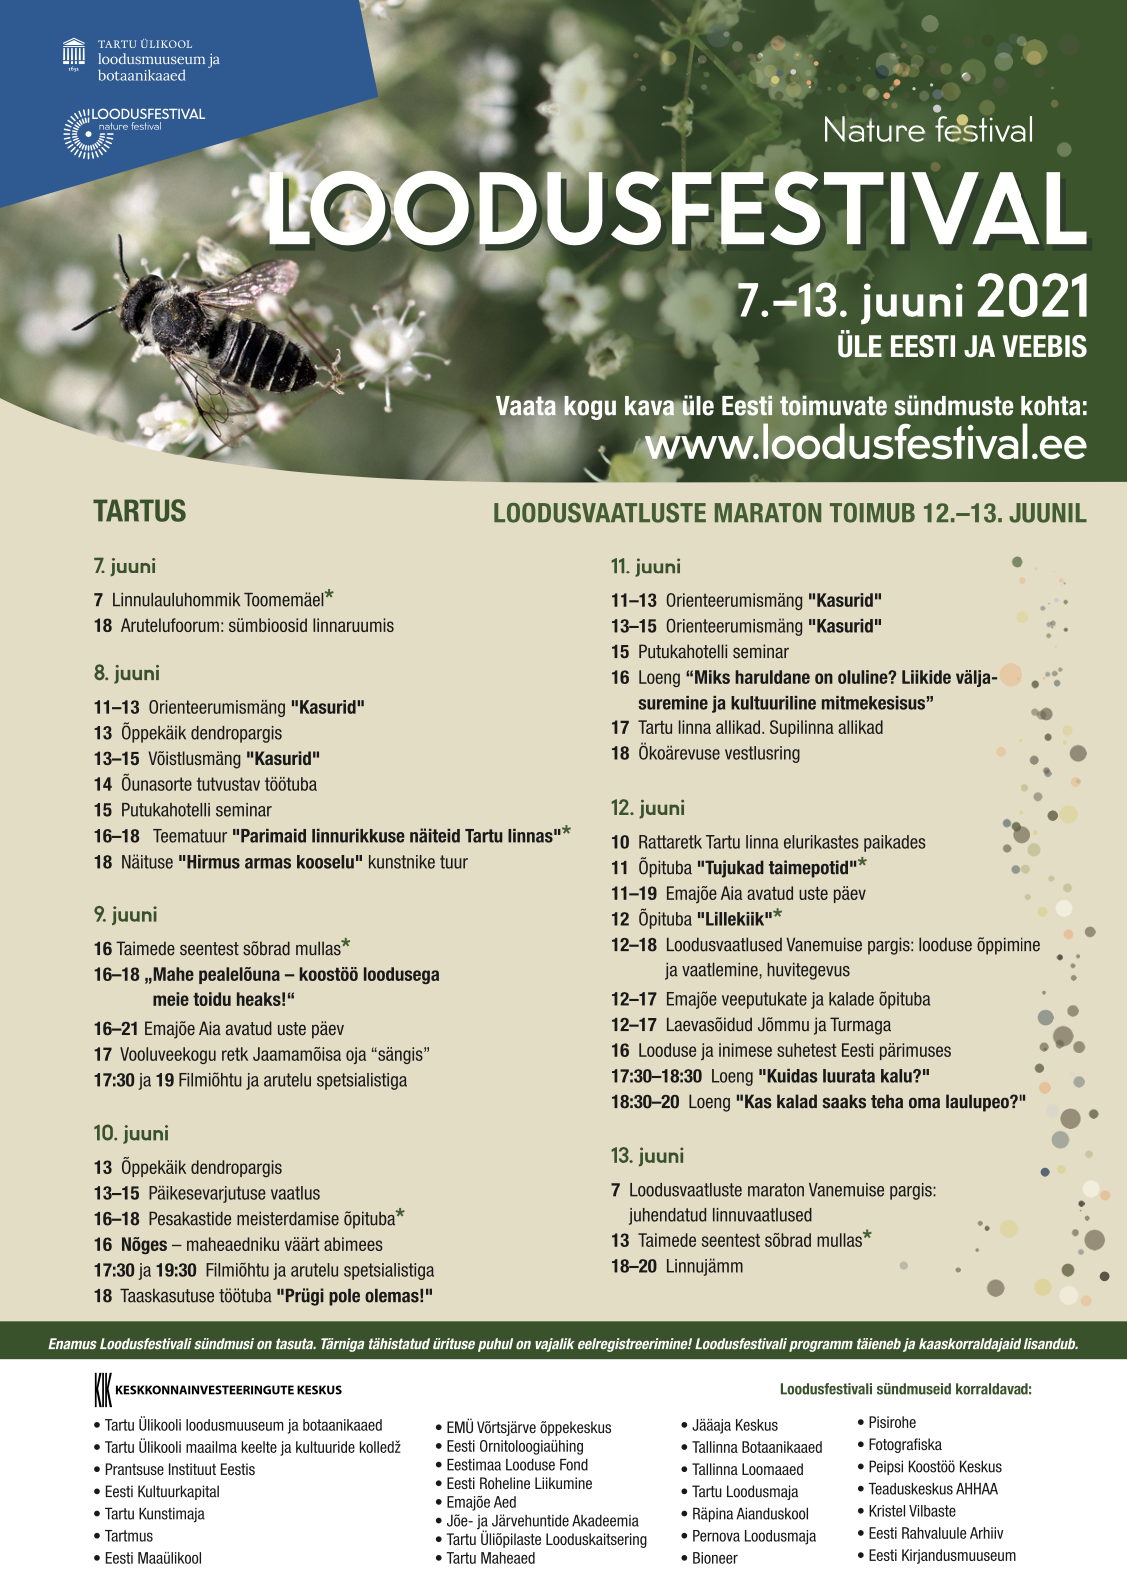 Loodusfestivali programm